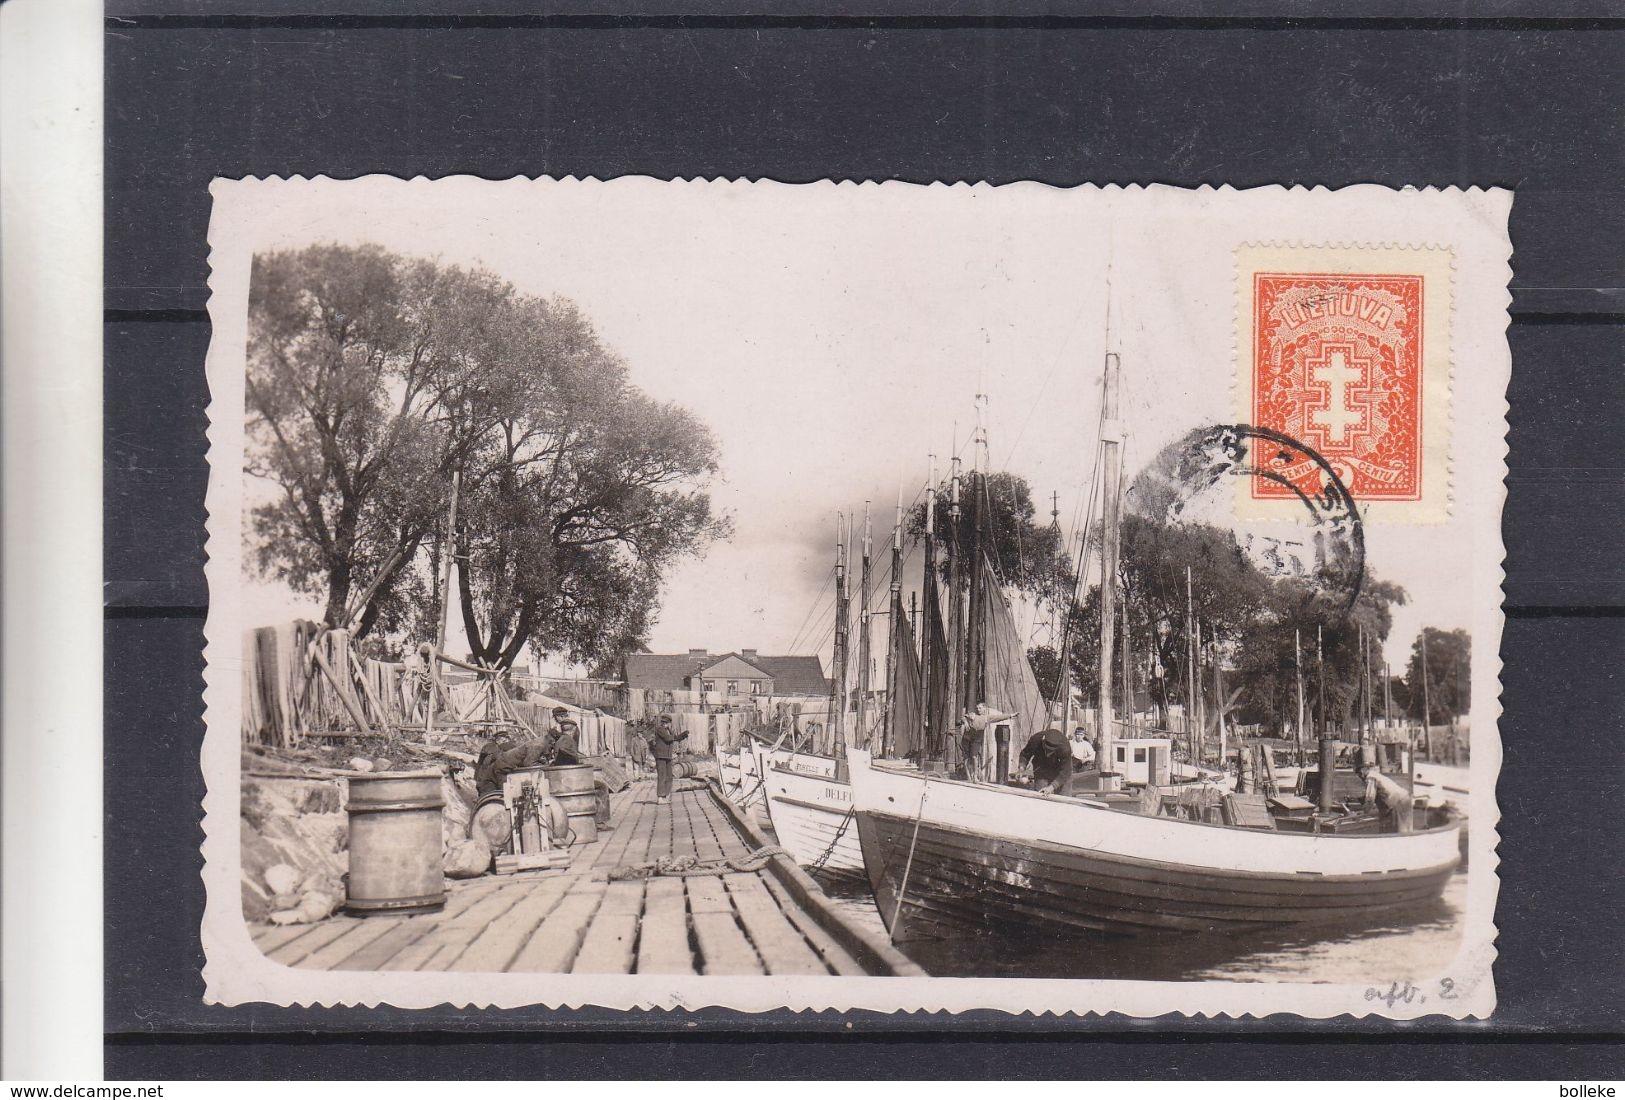 Lituanie - Carte Postale De 1935 - Oblit Kaunas - Lithuania